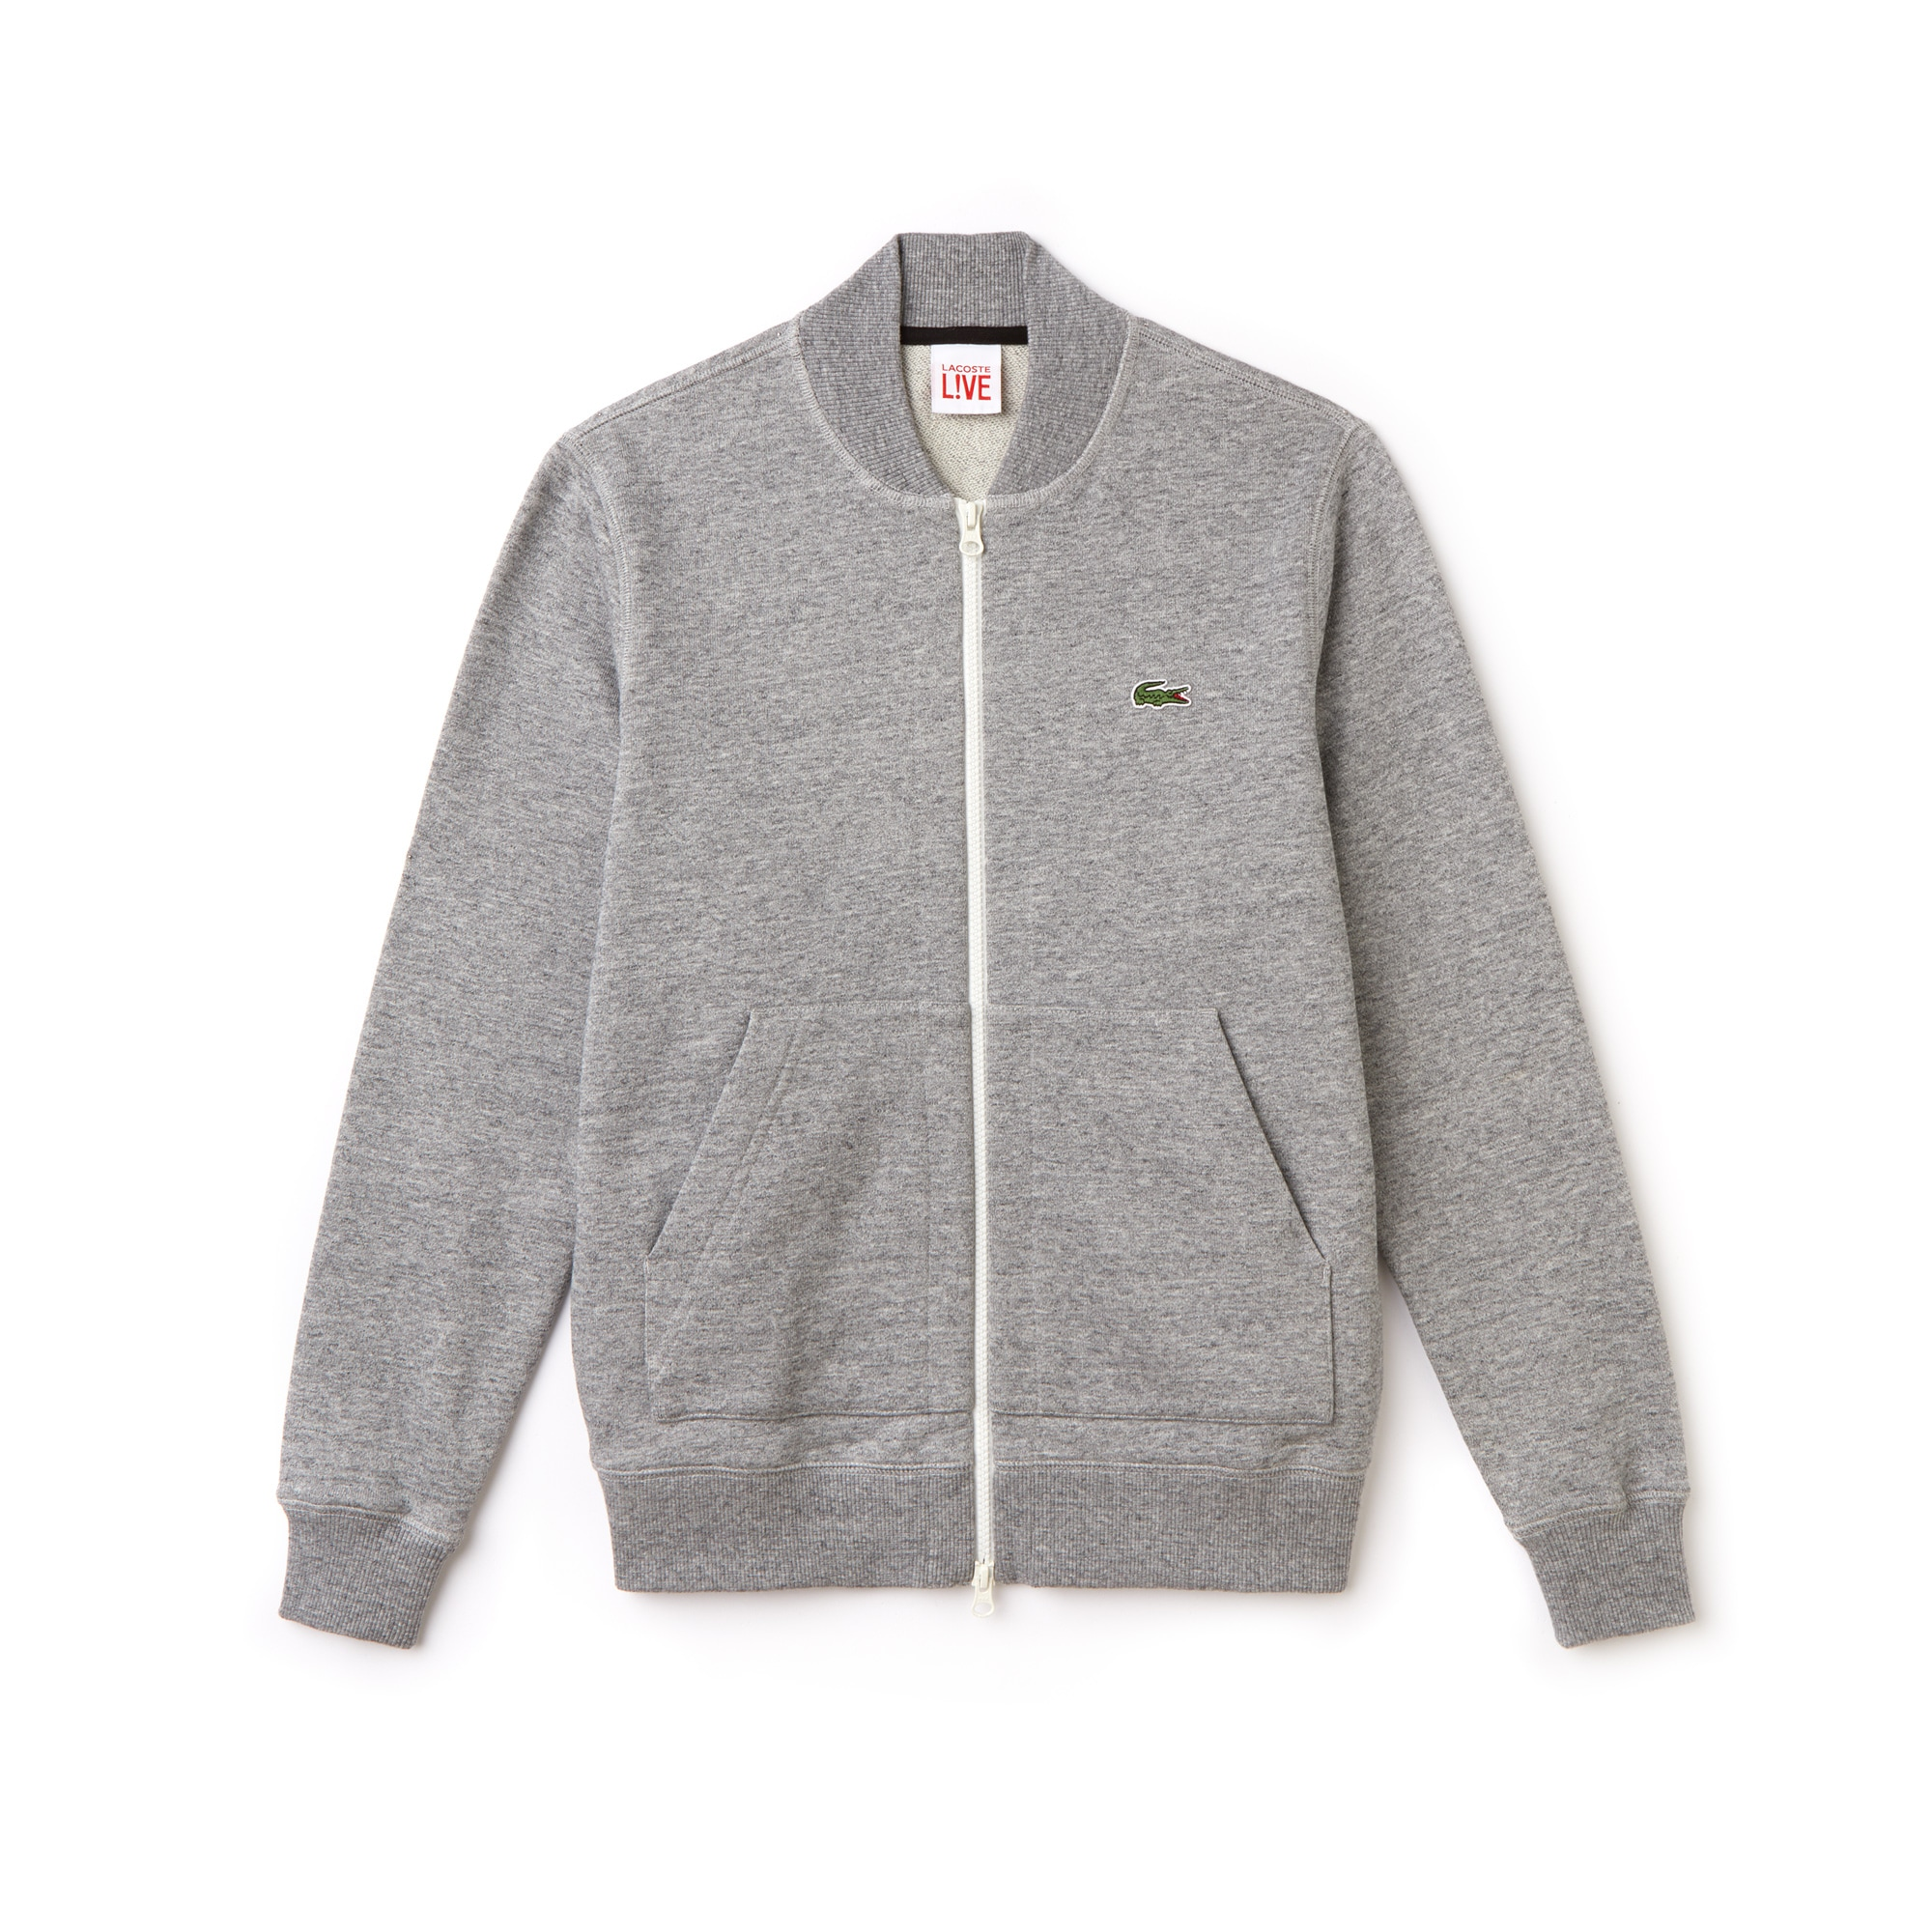 Lacoste - Unisex Lacoste LIVE Teddy Neck Zip Fleece Sweatshirt - 1